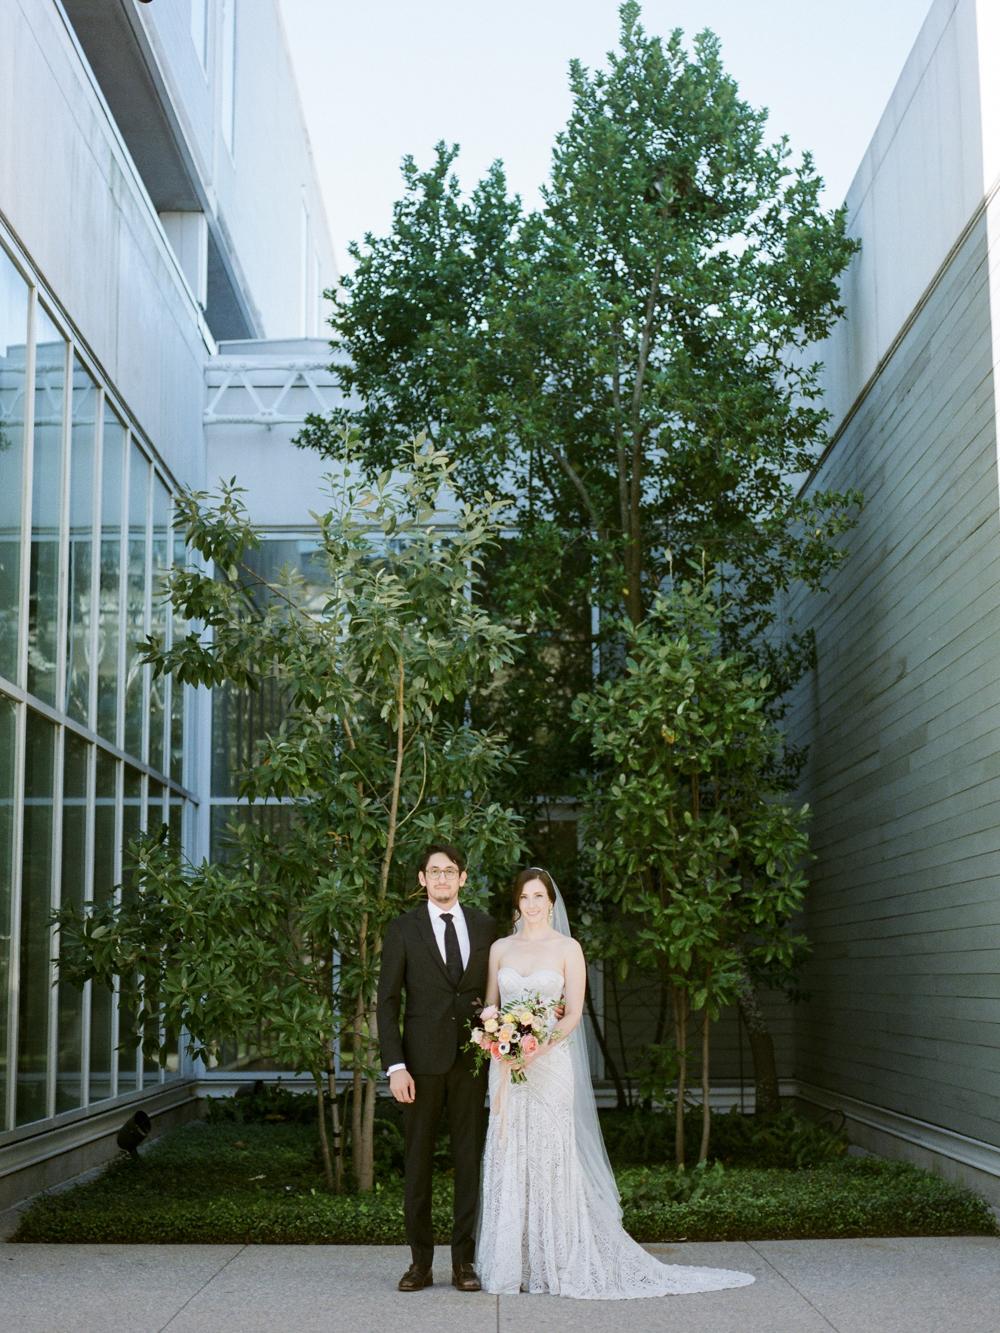 fall wedding at rothko chapel- houston wedding photographer-christine gosch - film photographer - elopement photographer- intimate wedding - lovely bride wedding gown-7.jpg